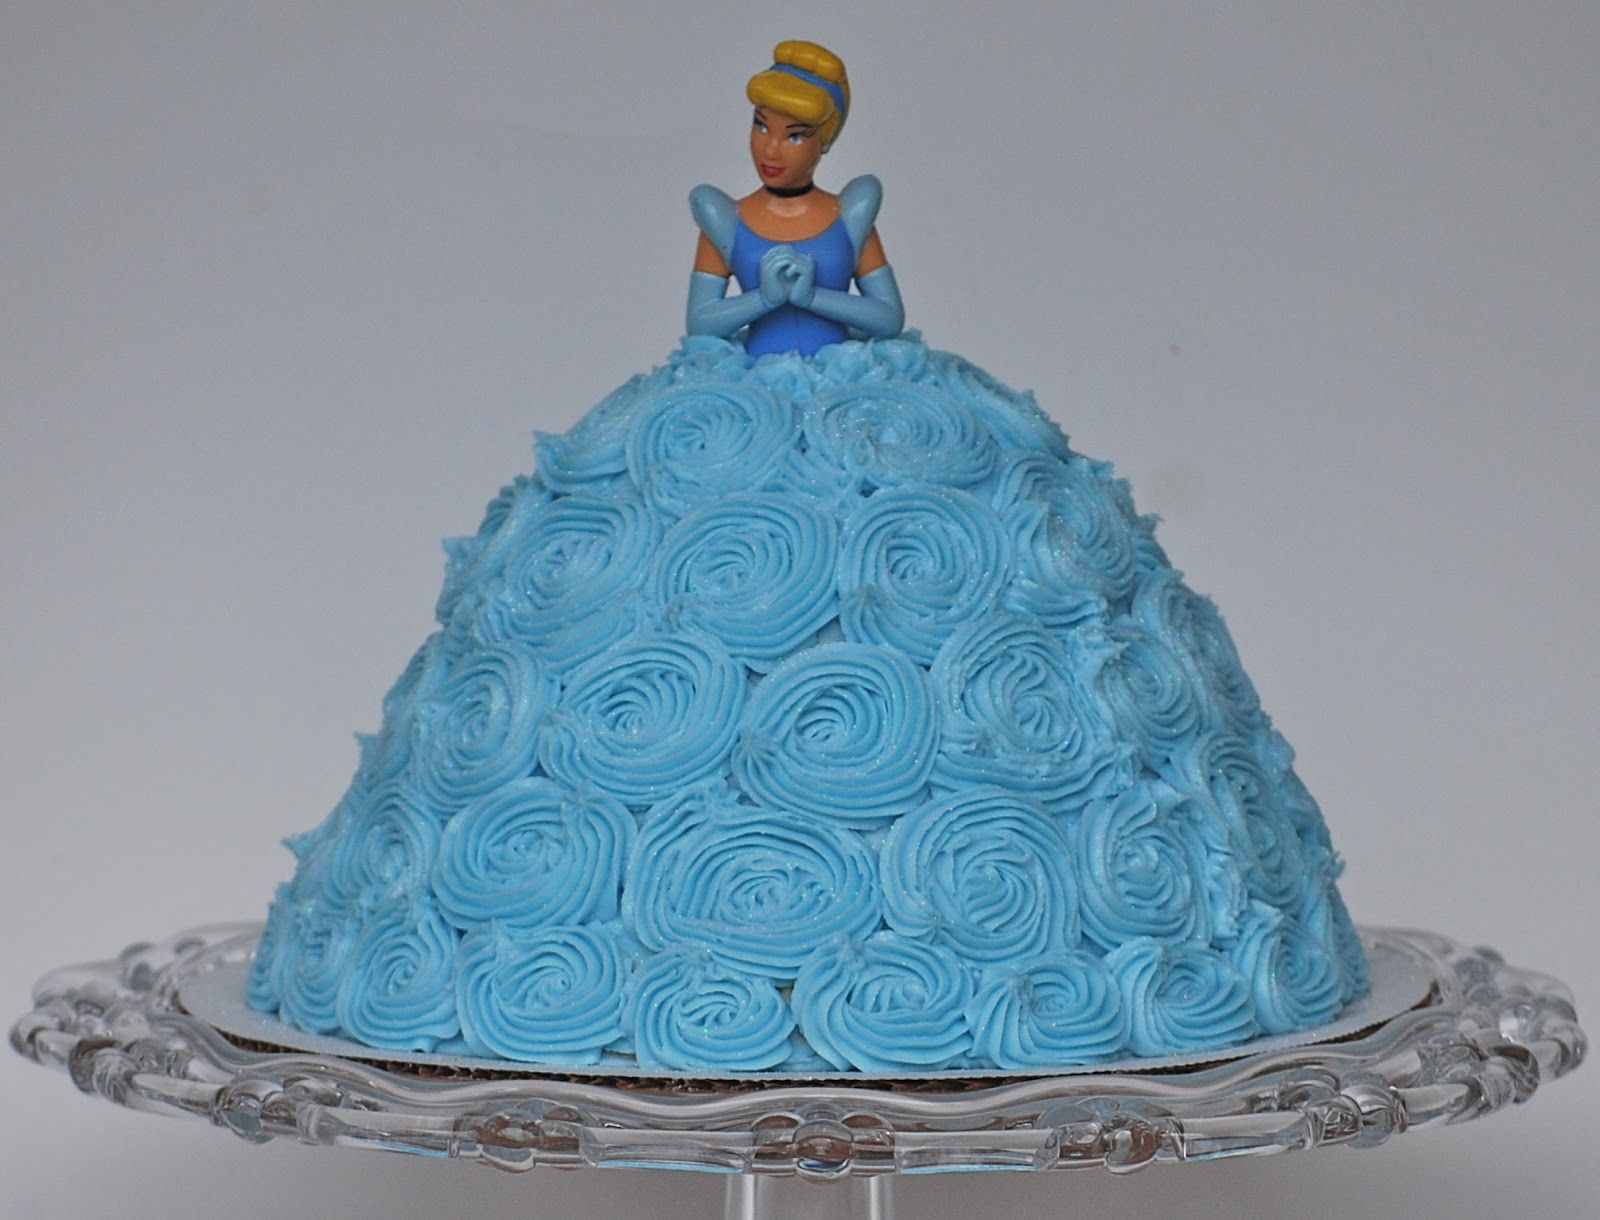 CinderellaCakeDecorations Cinderella Cakes Decoration Ideas